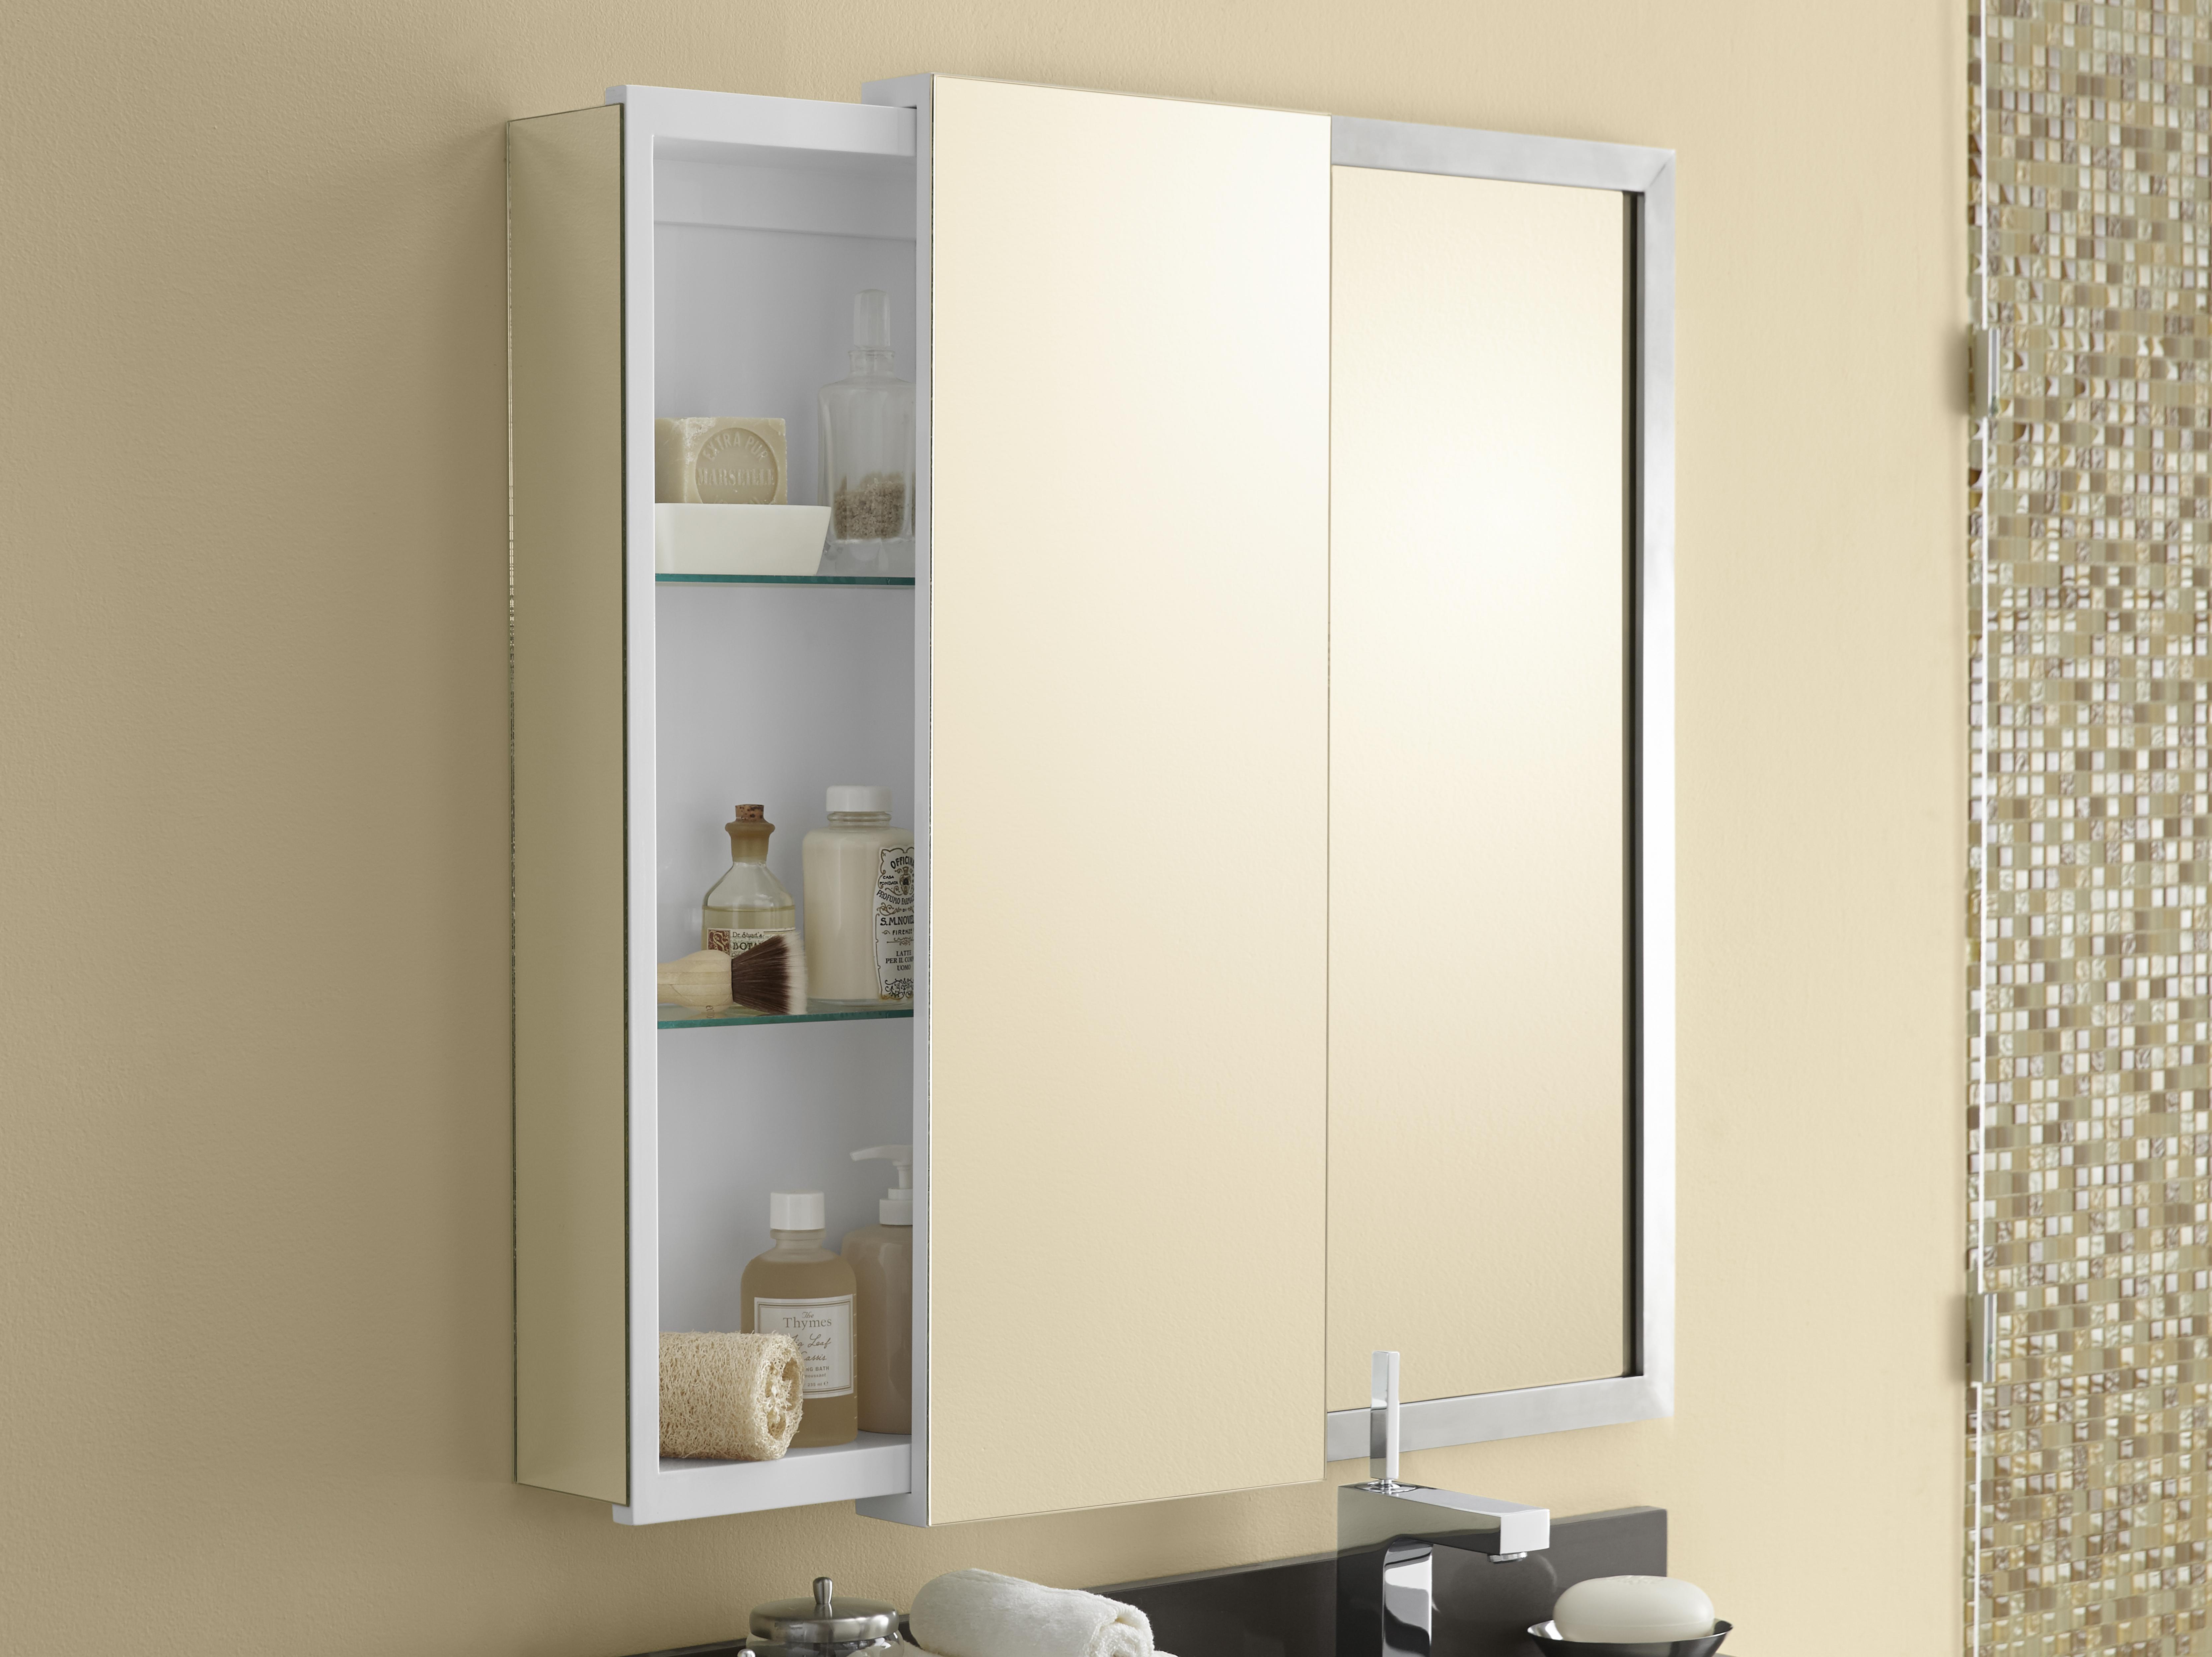 "Model: 687332-00 | Ronbow Mirrored Sliding Door 12"" x 32"" Bathroom Wall Cabinet"